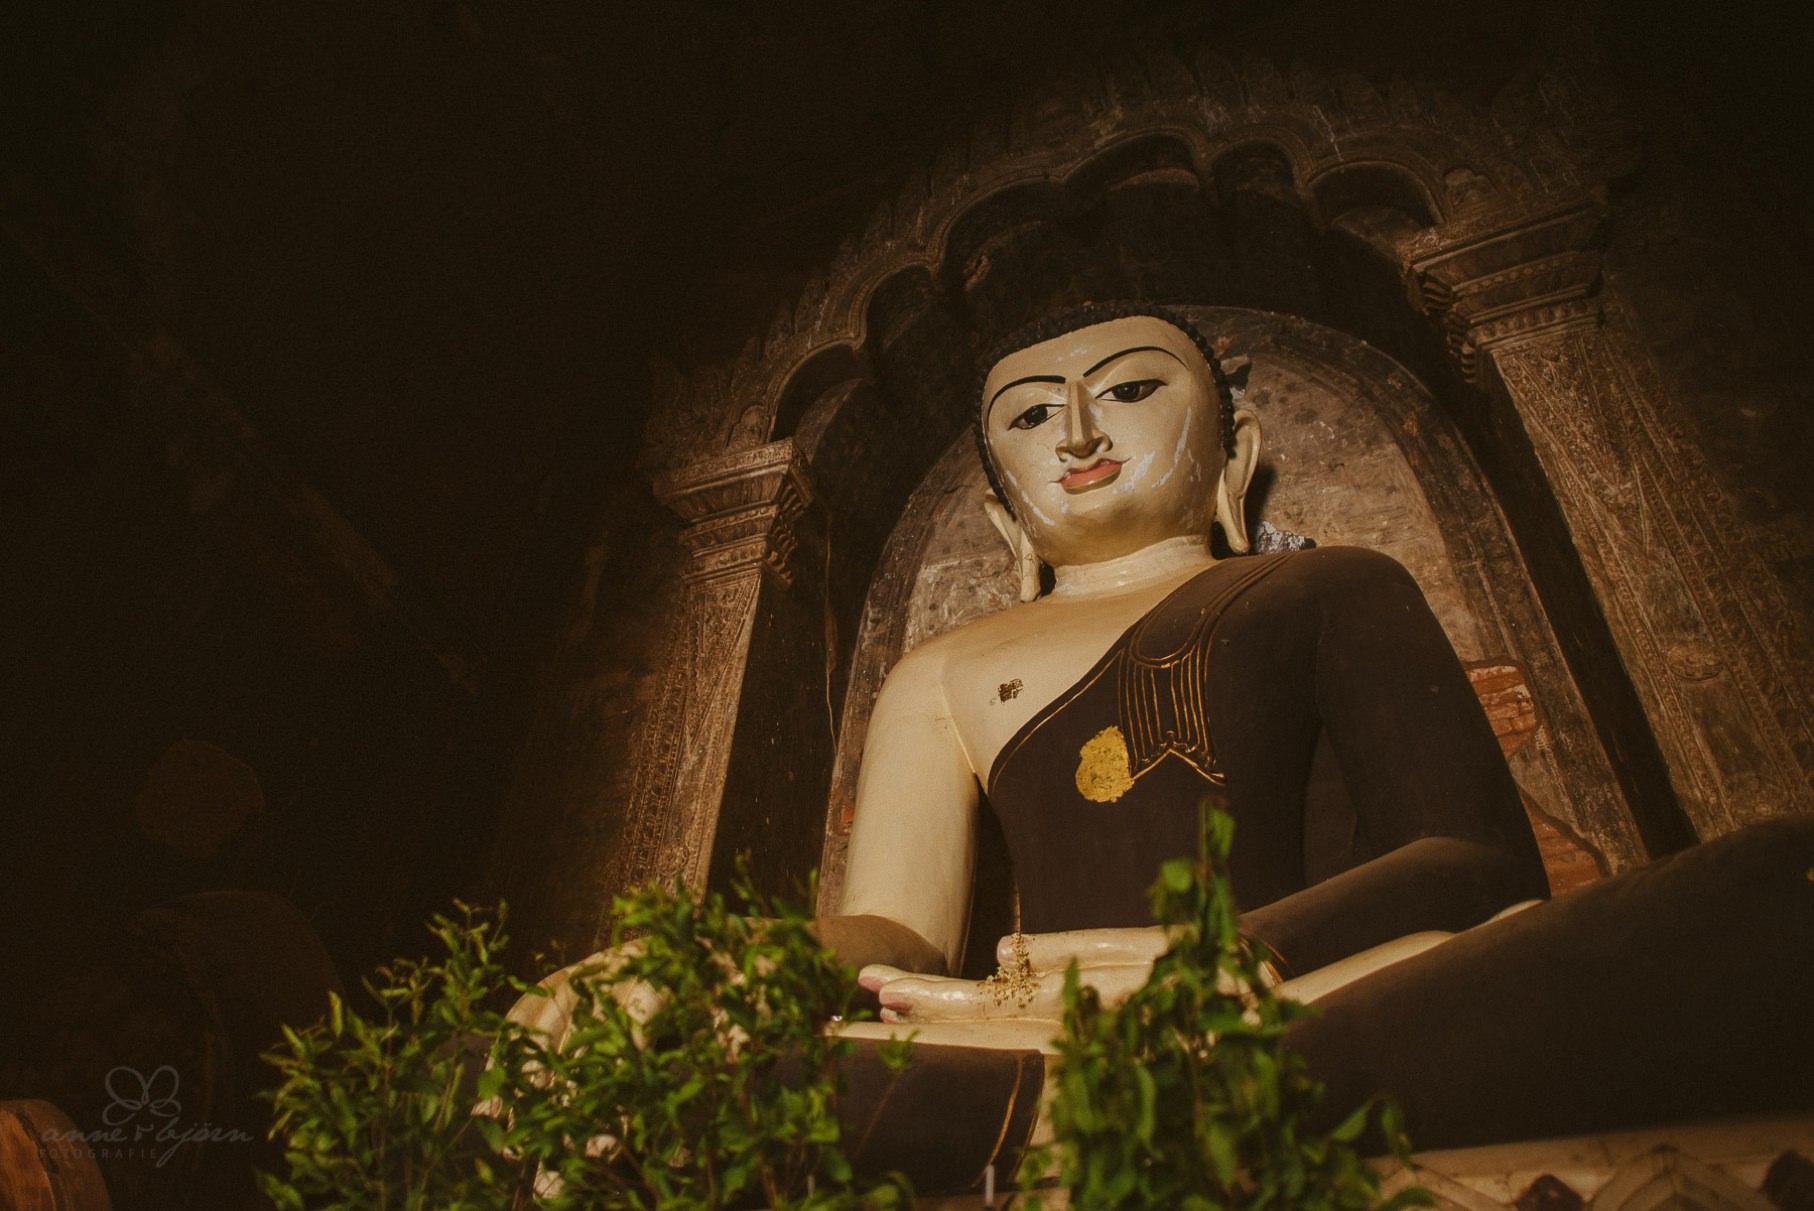 0015 bagan ngwesaung d76 7738 1 - Tempelstadt Bagan & tauchen am Ngwesaungbeach